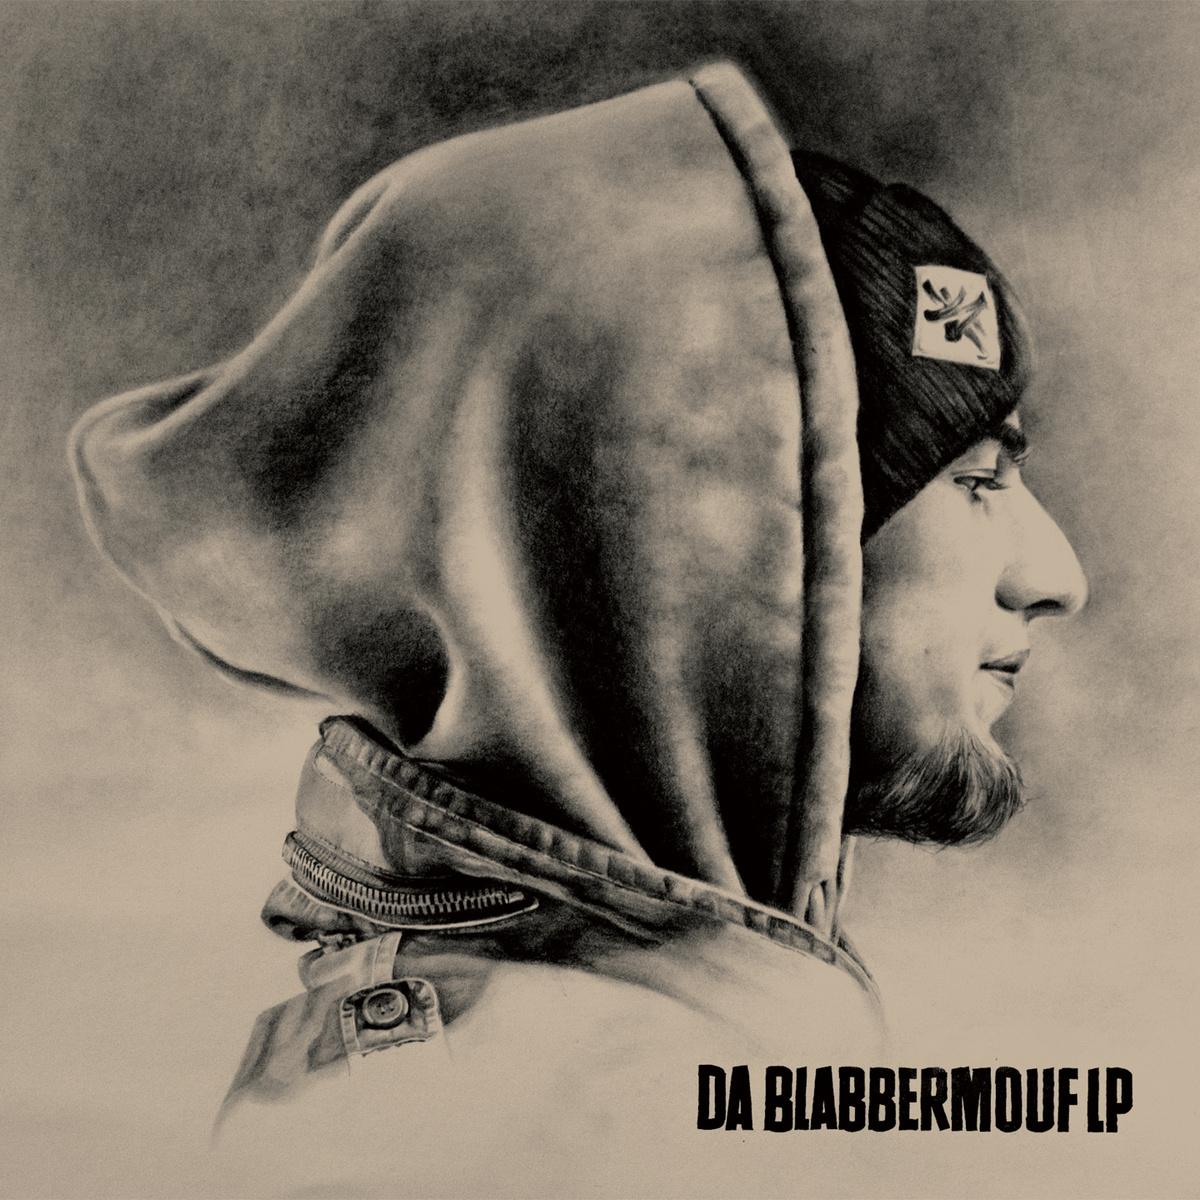 Da_blabbermouf_lp_-_backwitdaboomandblabberastikrhymes